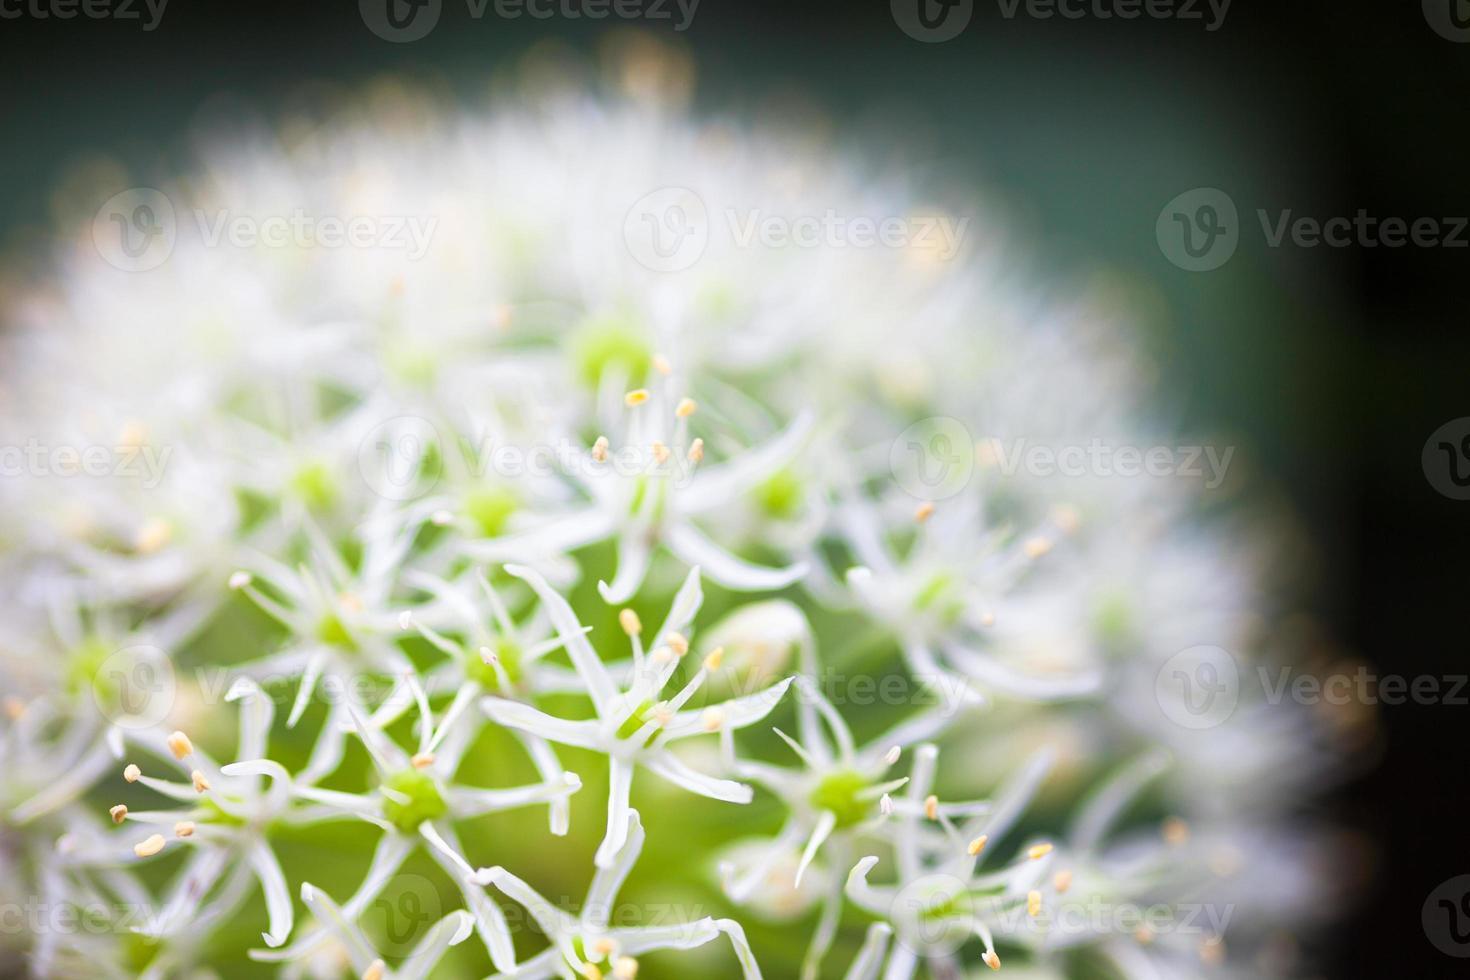 fioritura cipolla ornamentale bianca (allium) foto